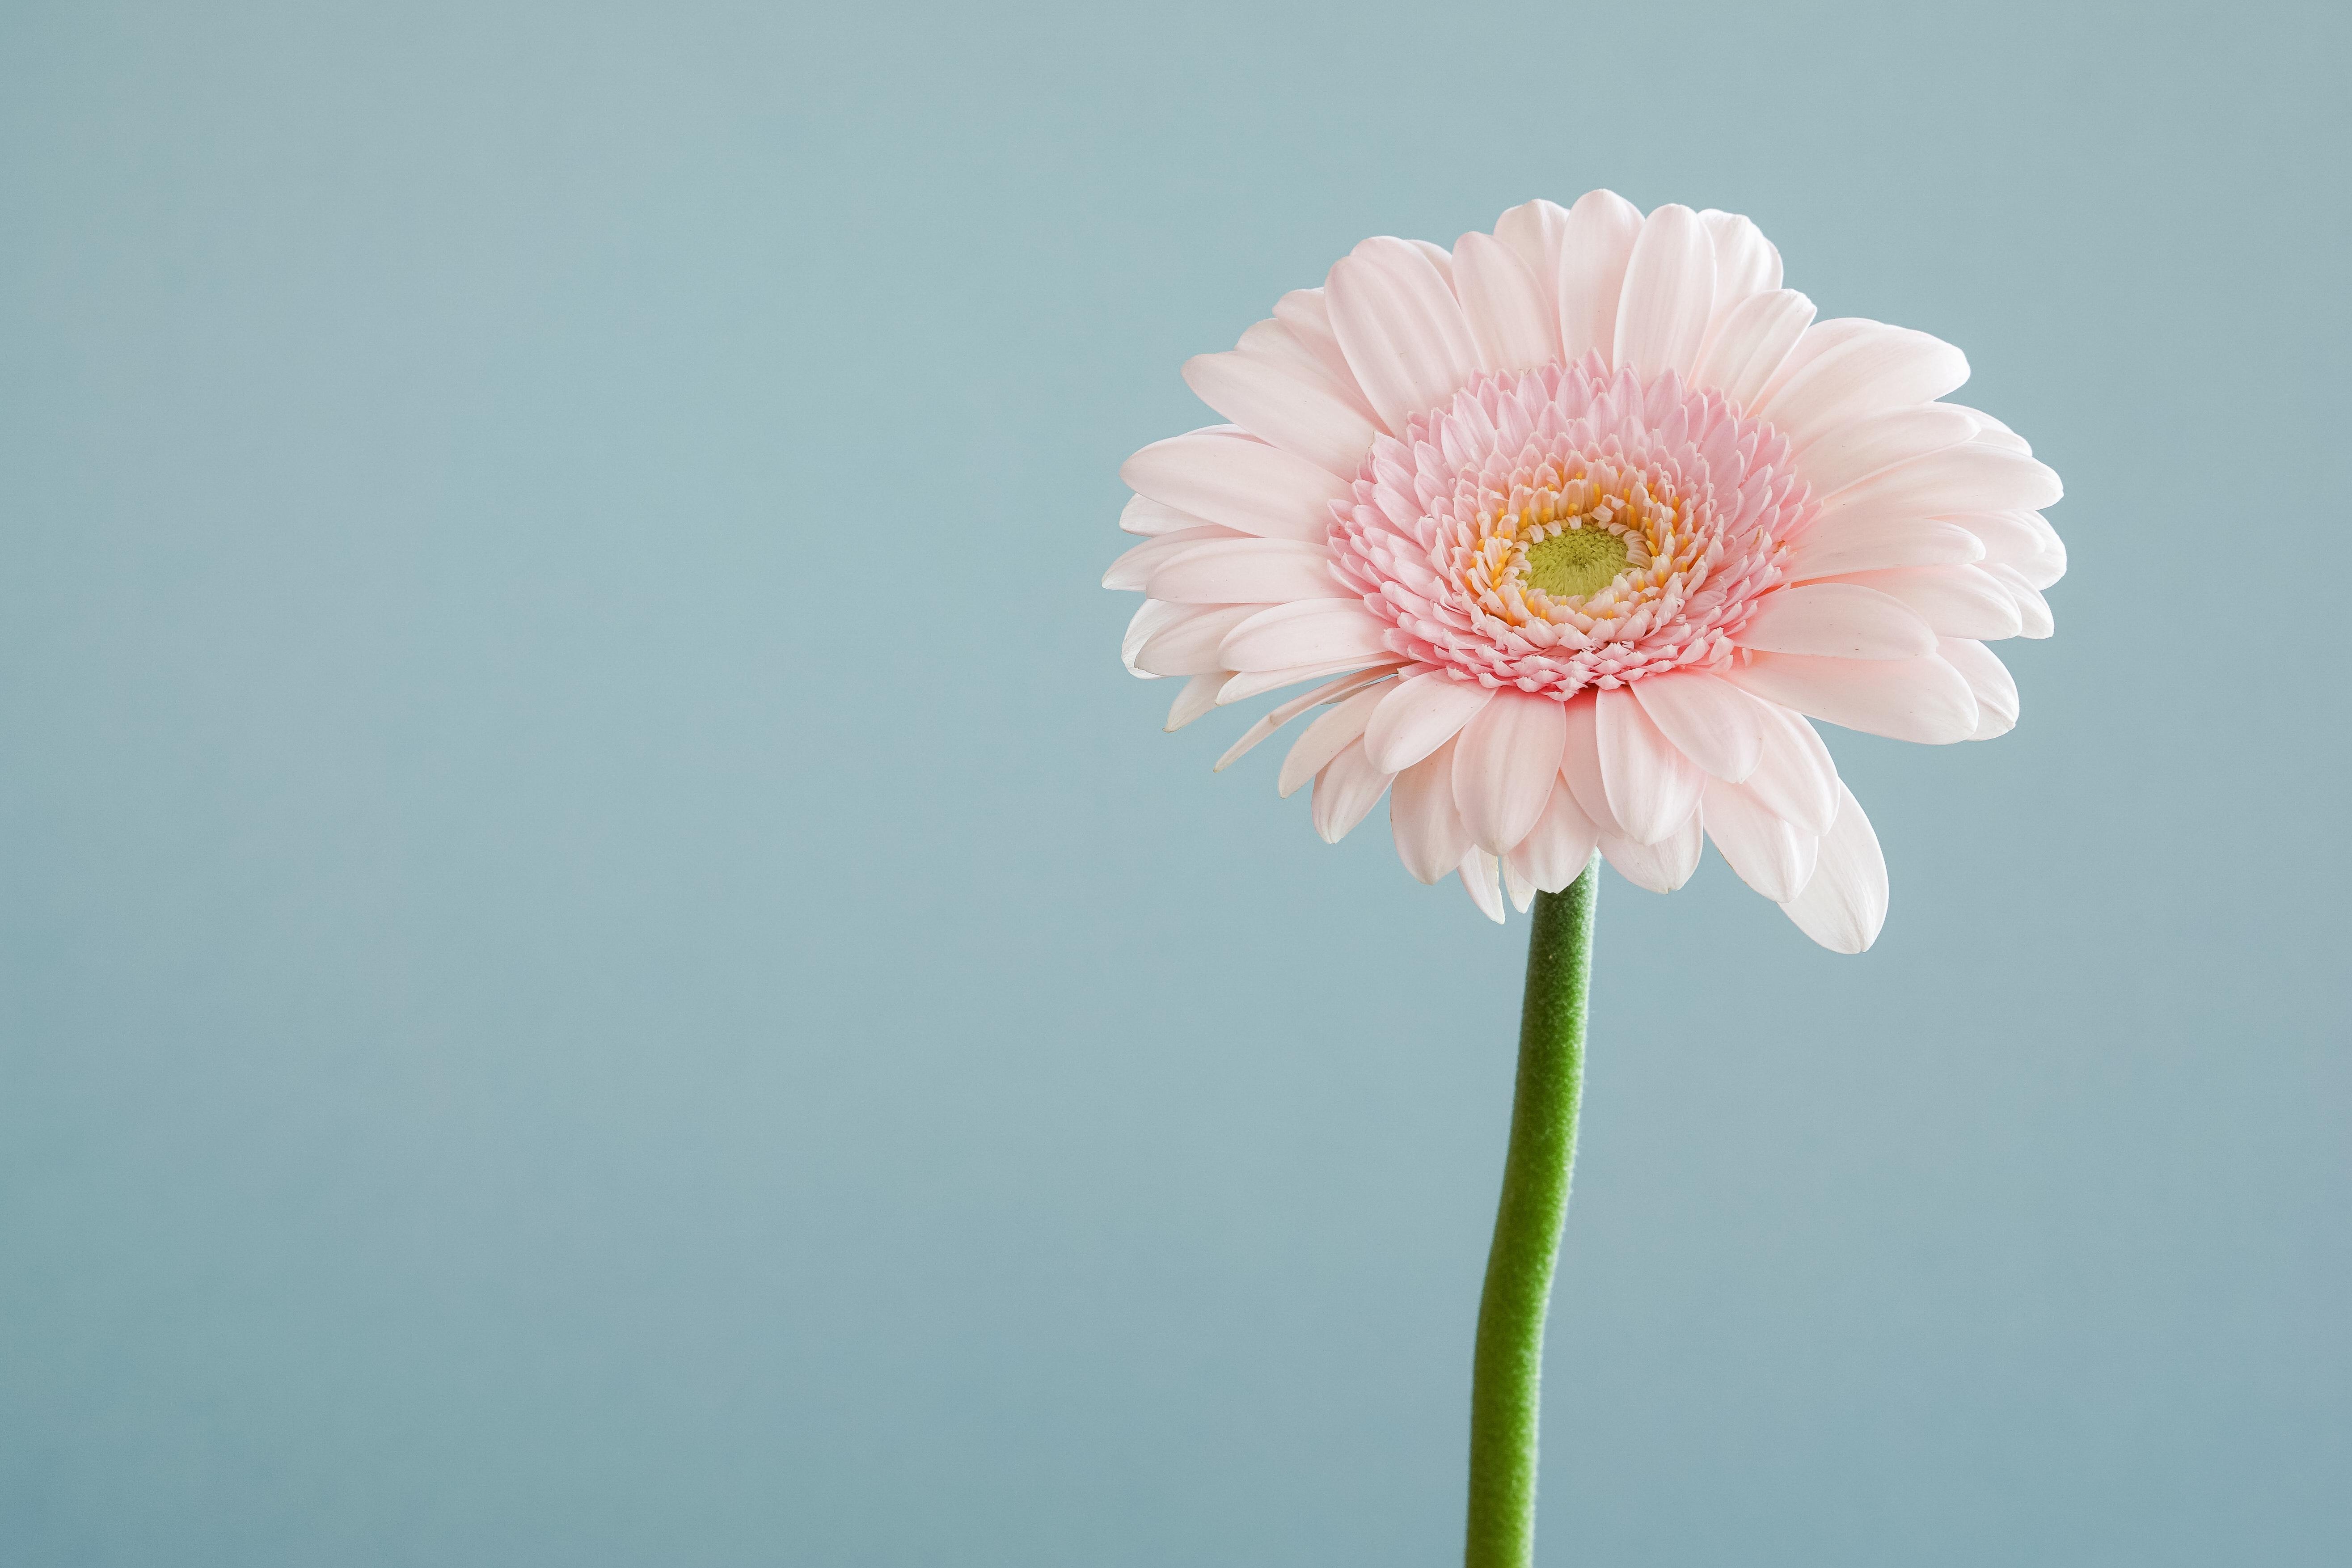 Free Images : flower, petal, pink, flora, close up, gerbera, macro ...